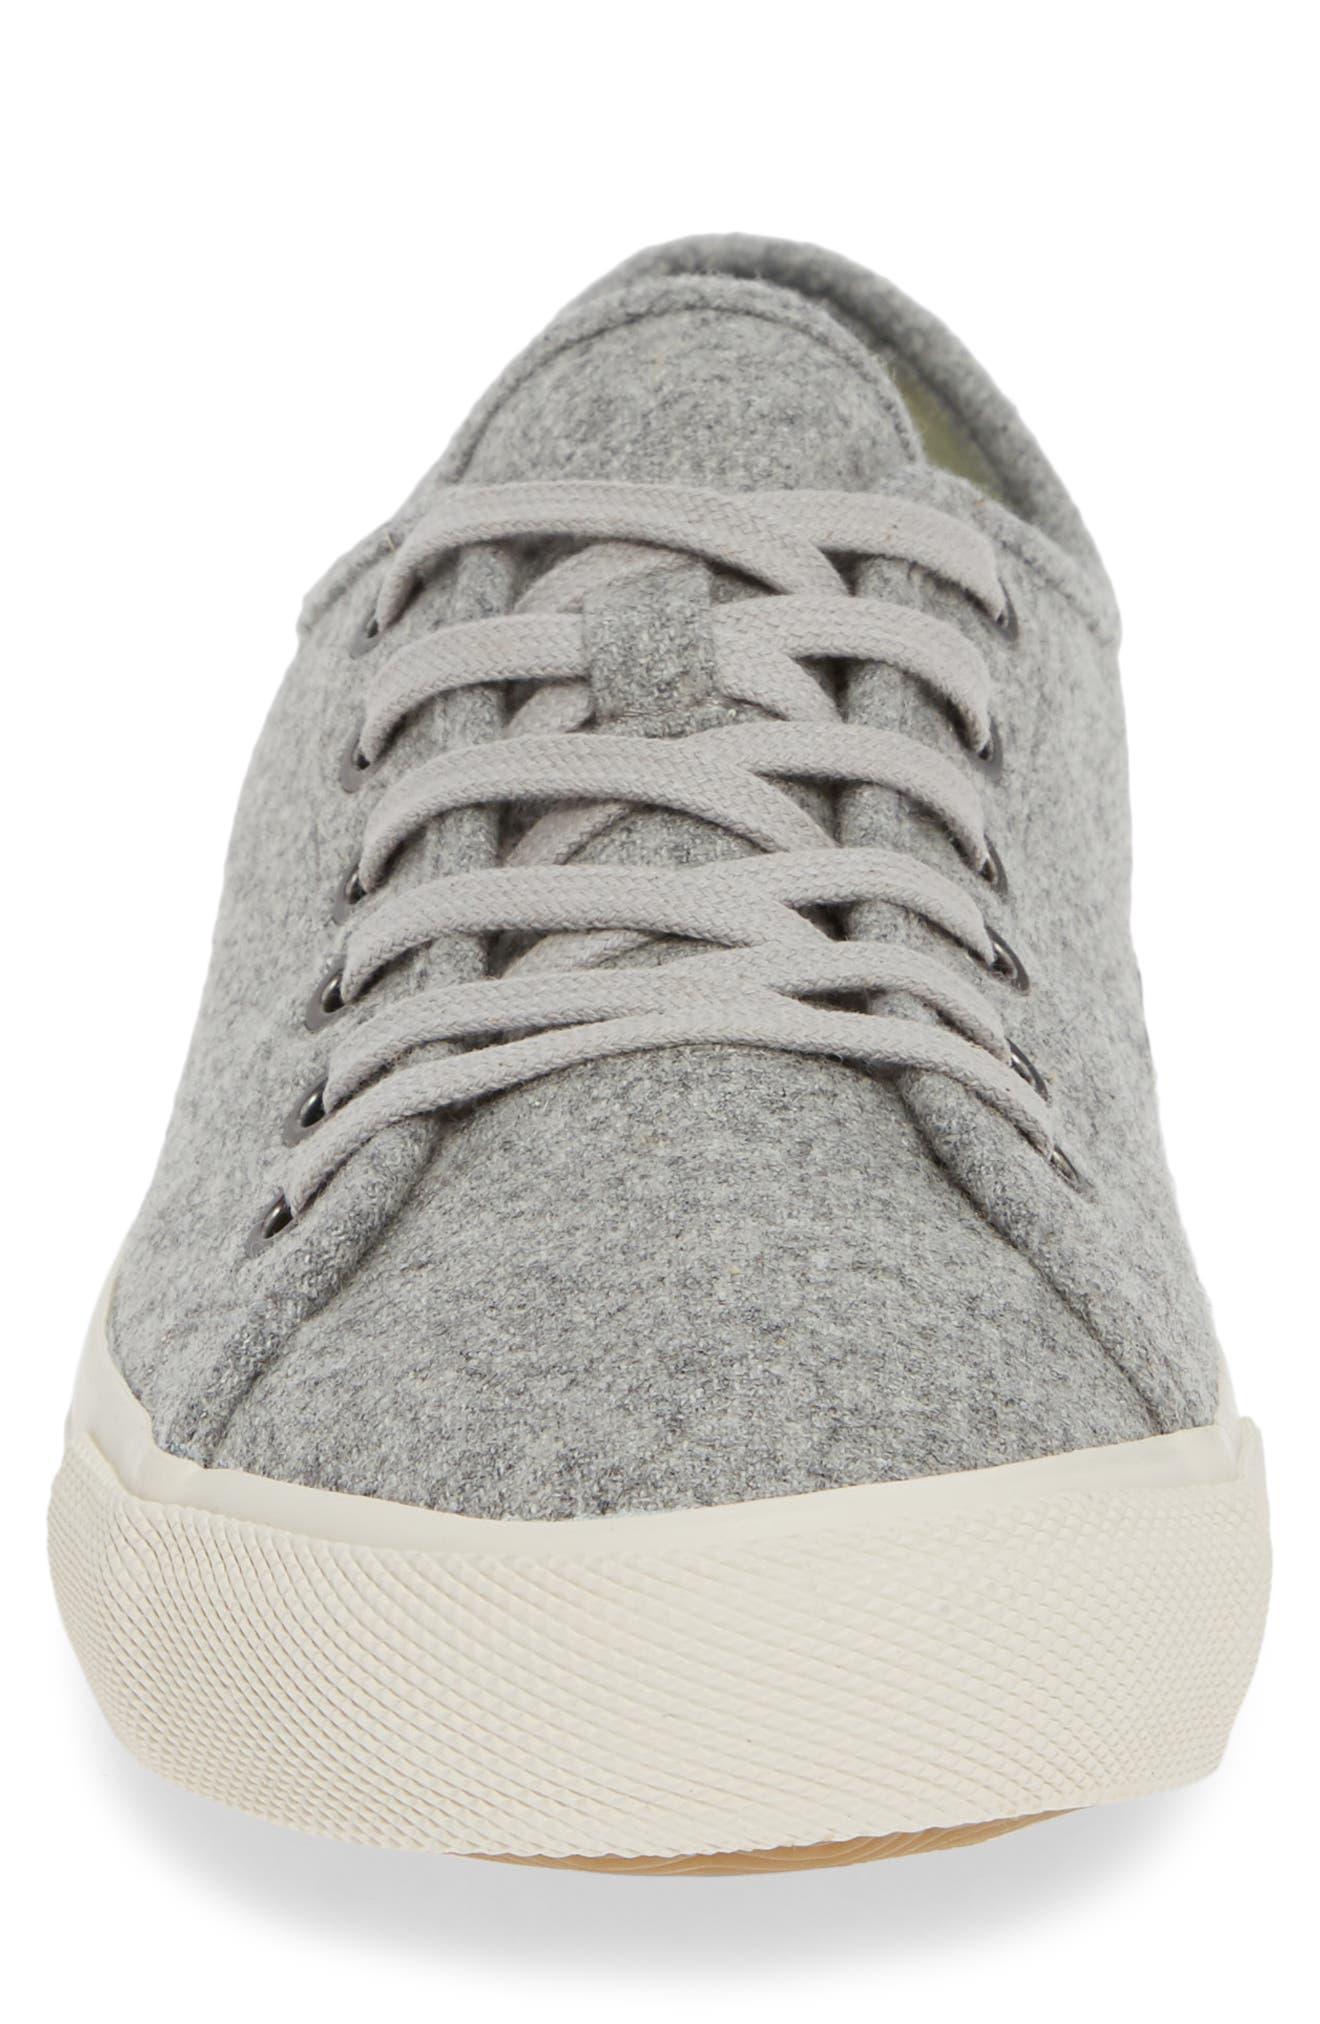 Monterey Grayers Sneaker,                             Alternate thumbnail 4, color,                             LIGHT GREY WOOL